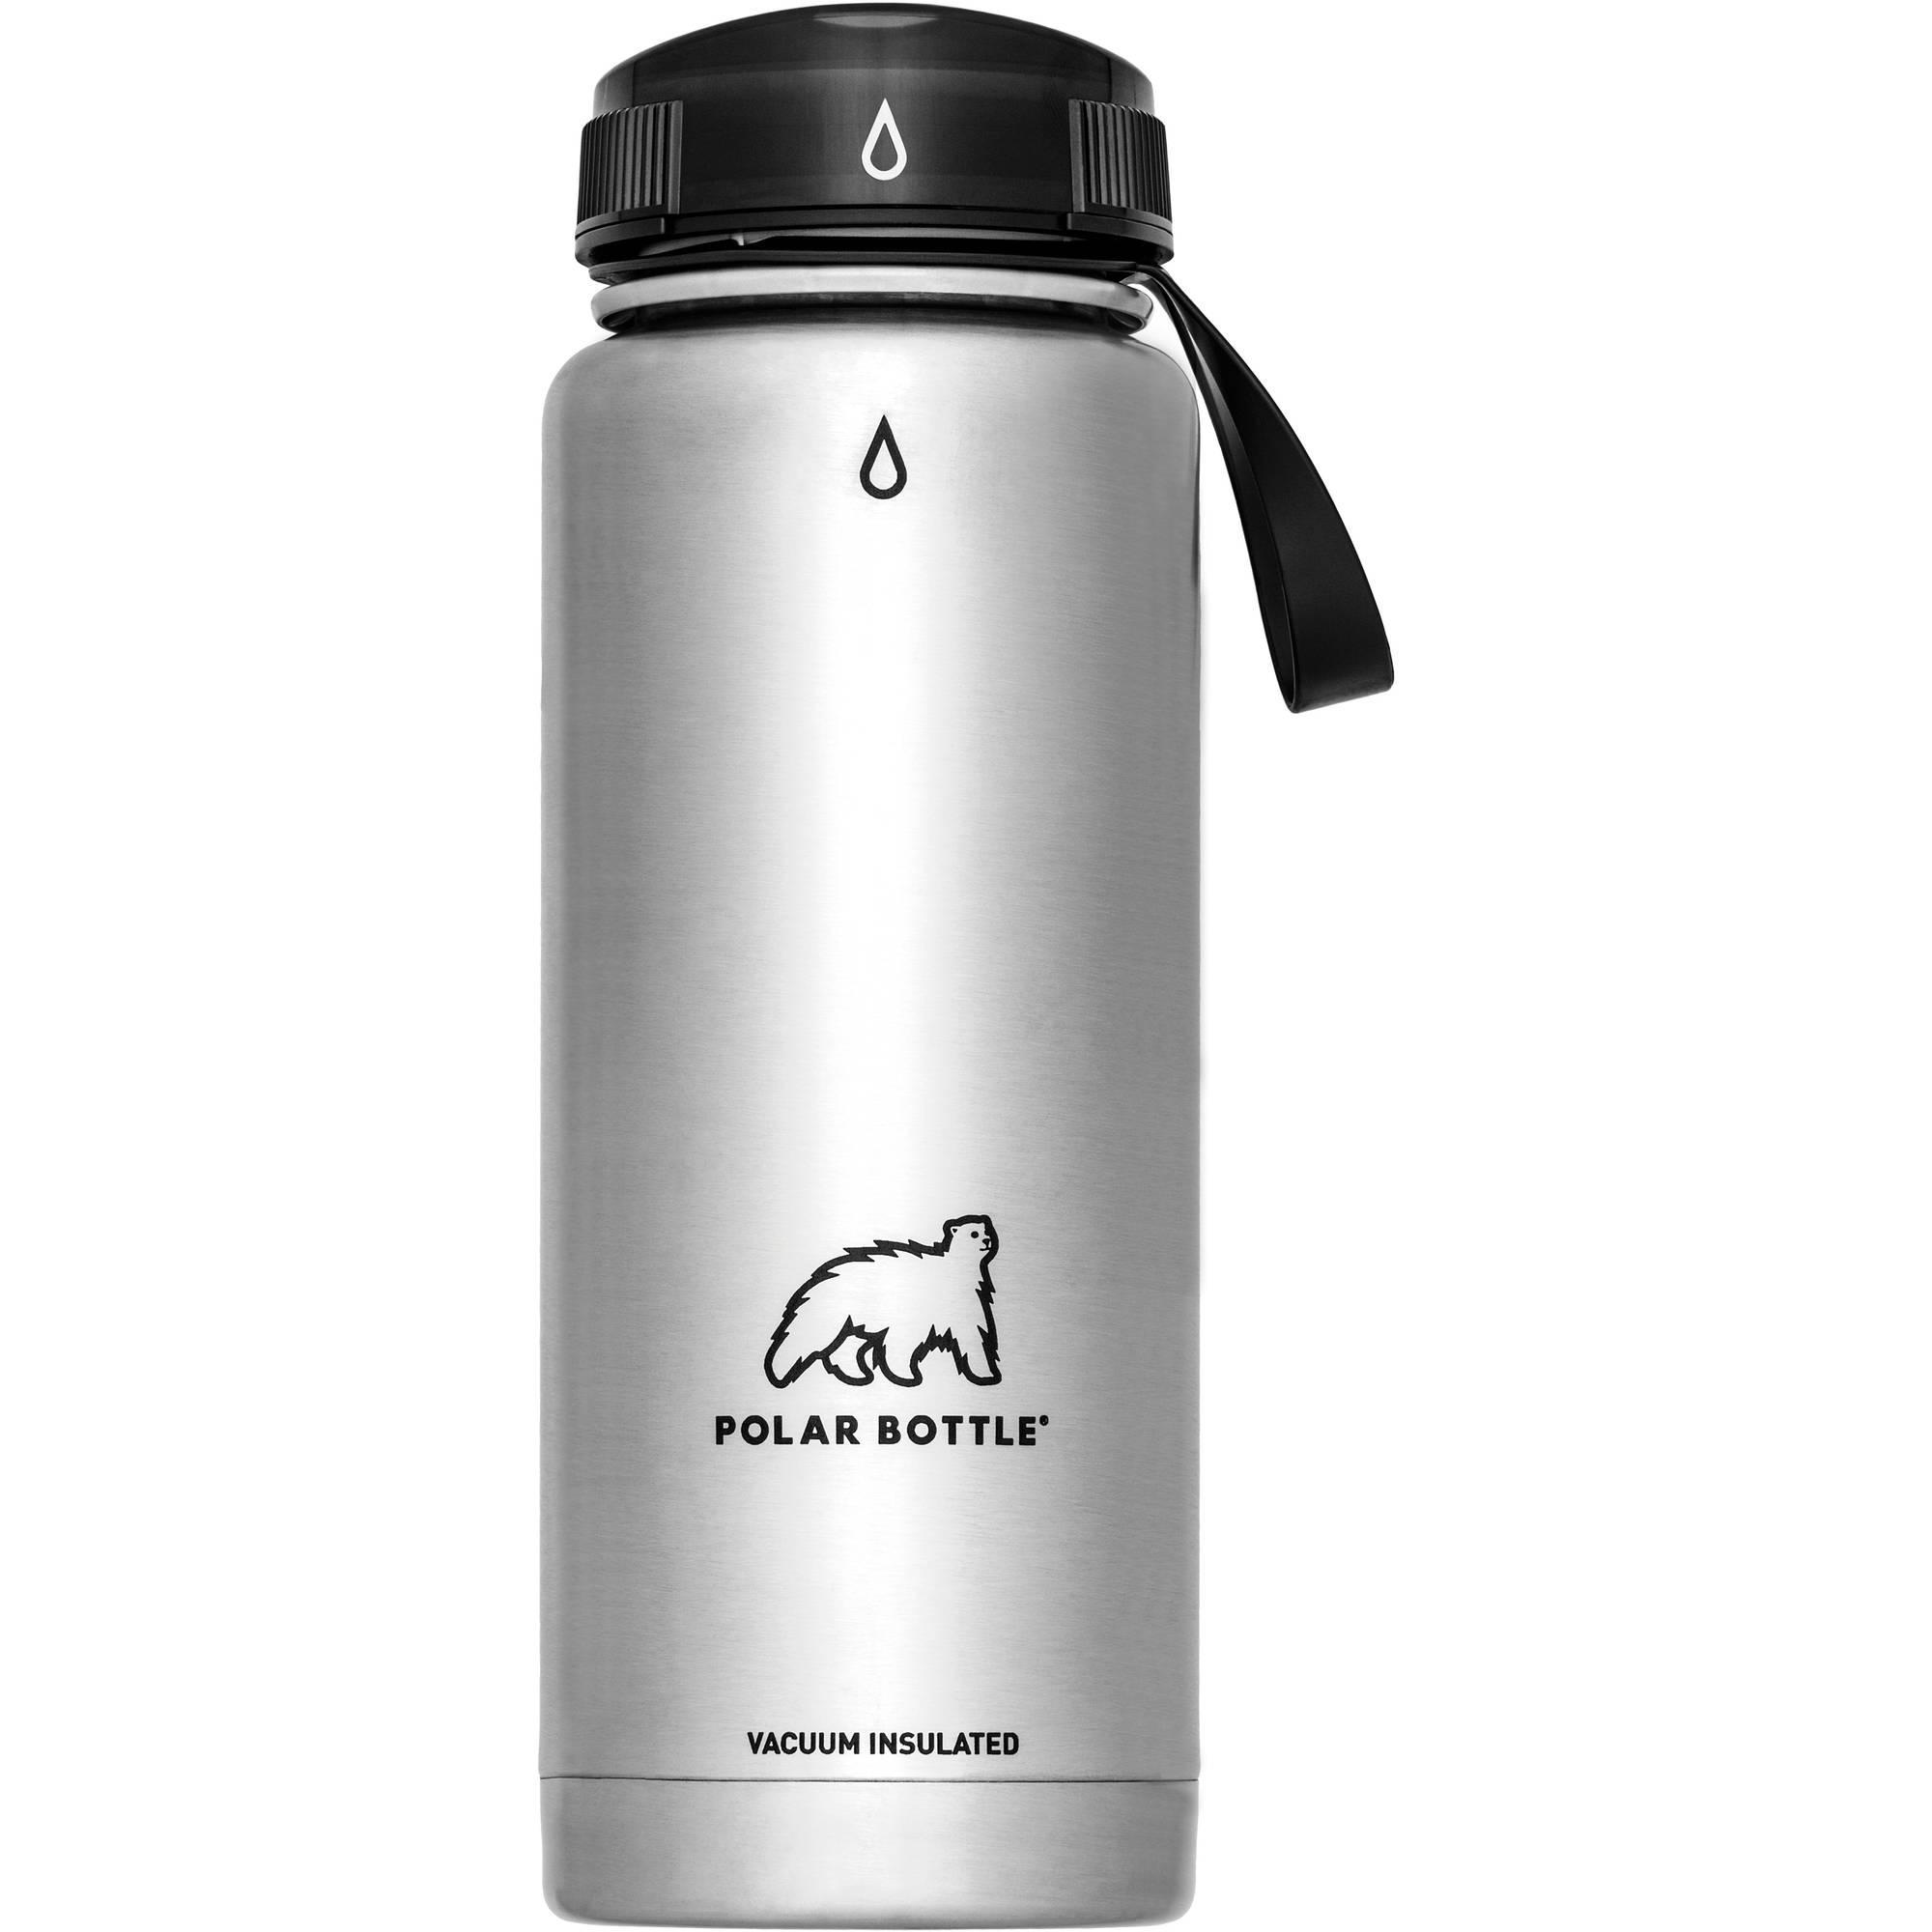 Polar Bottle Thermaluxe Vacuum Insulated Stainless Steel Travel Mug